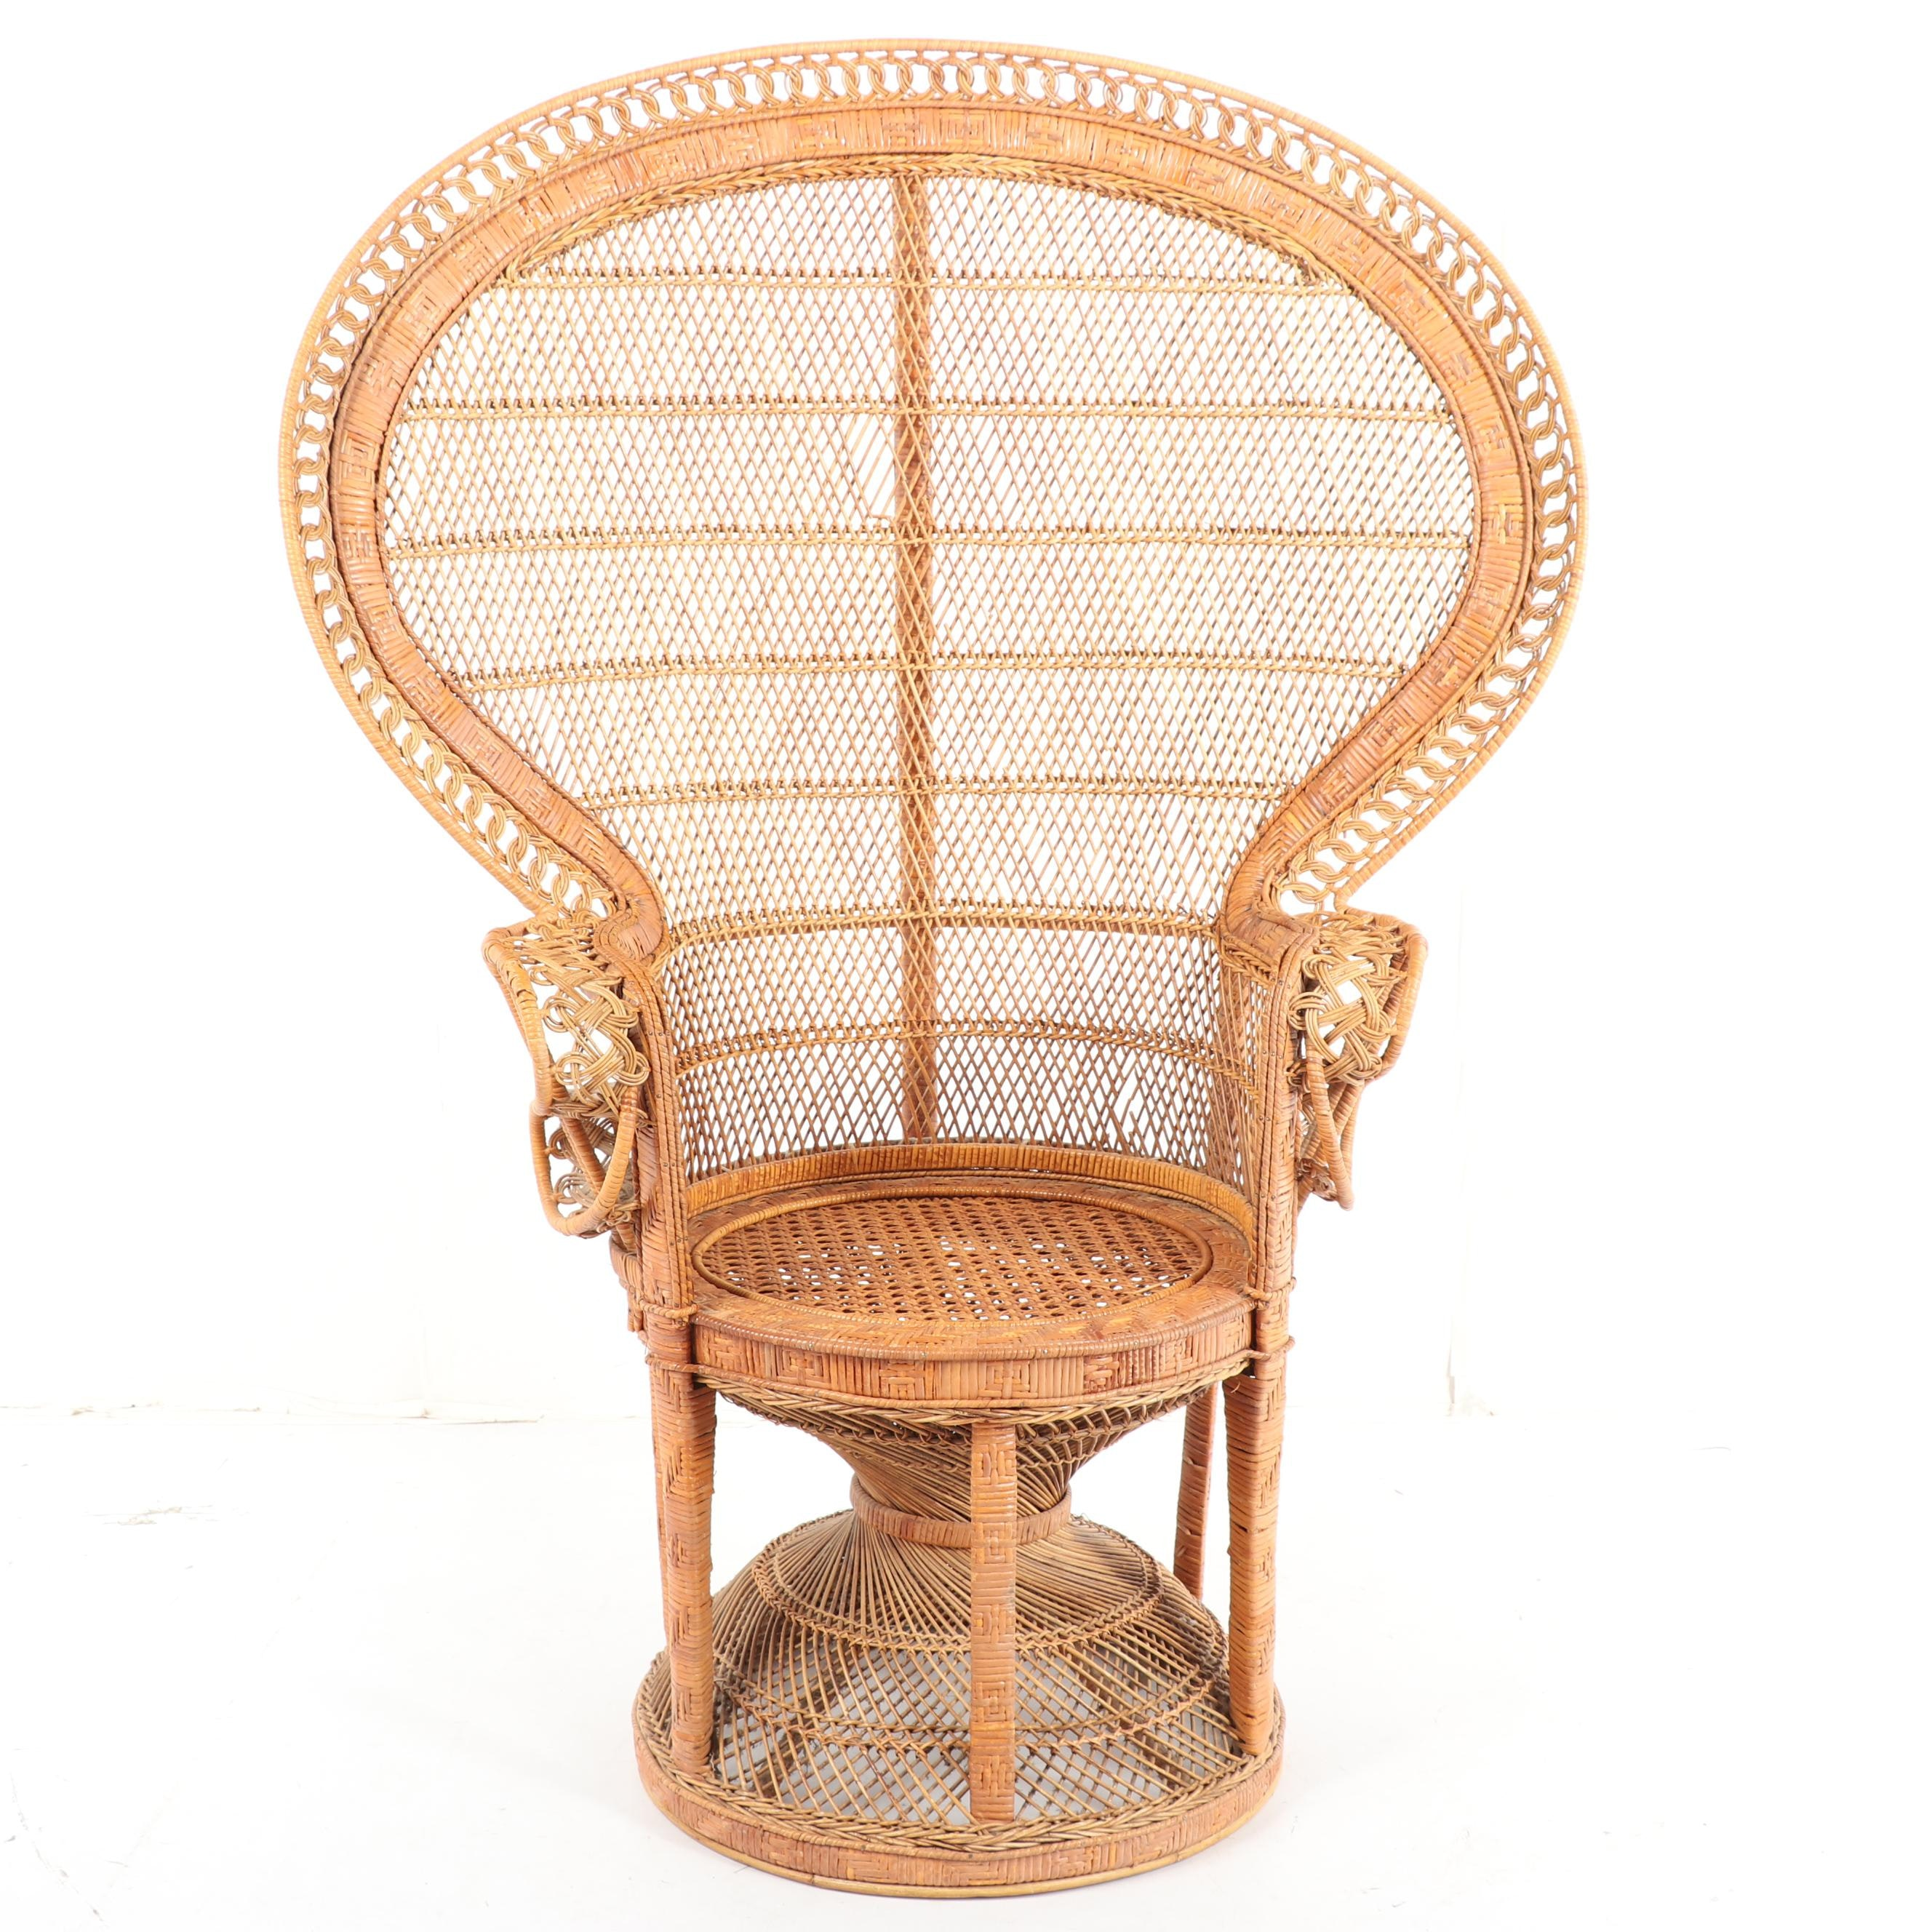 Rattan Peacock Chair, Late 20th Century